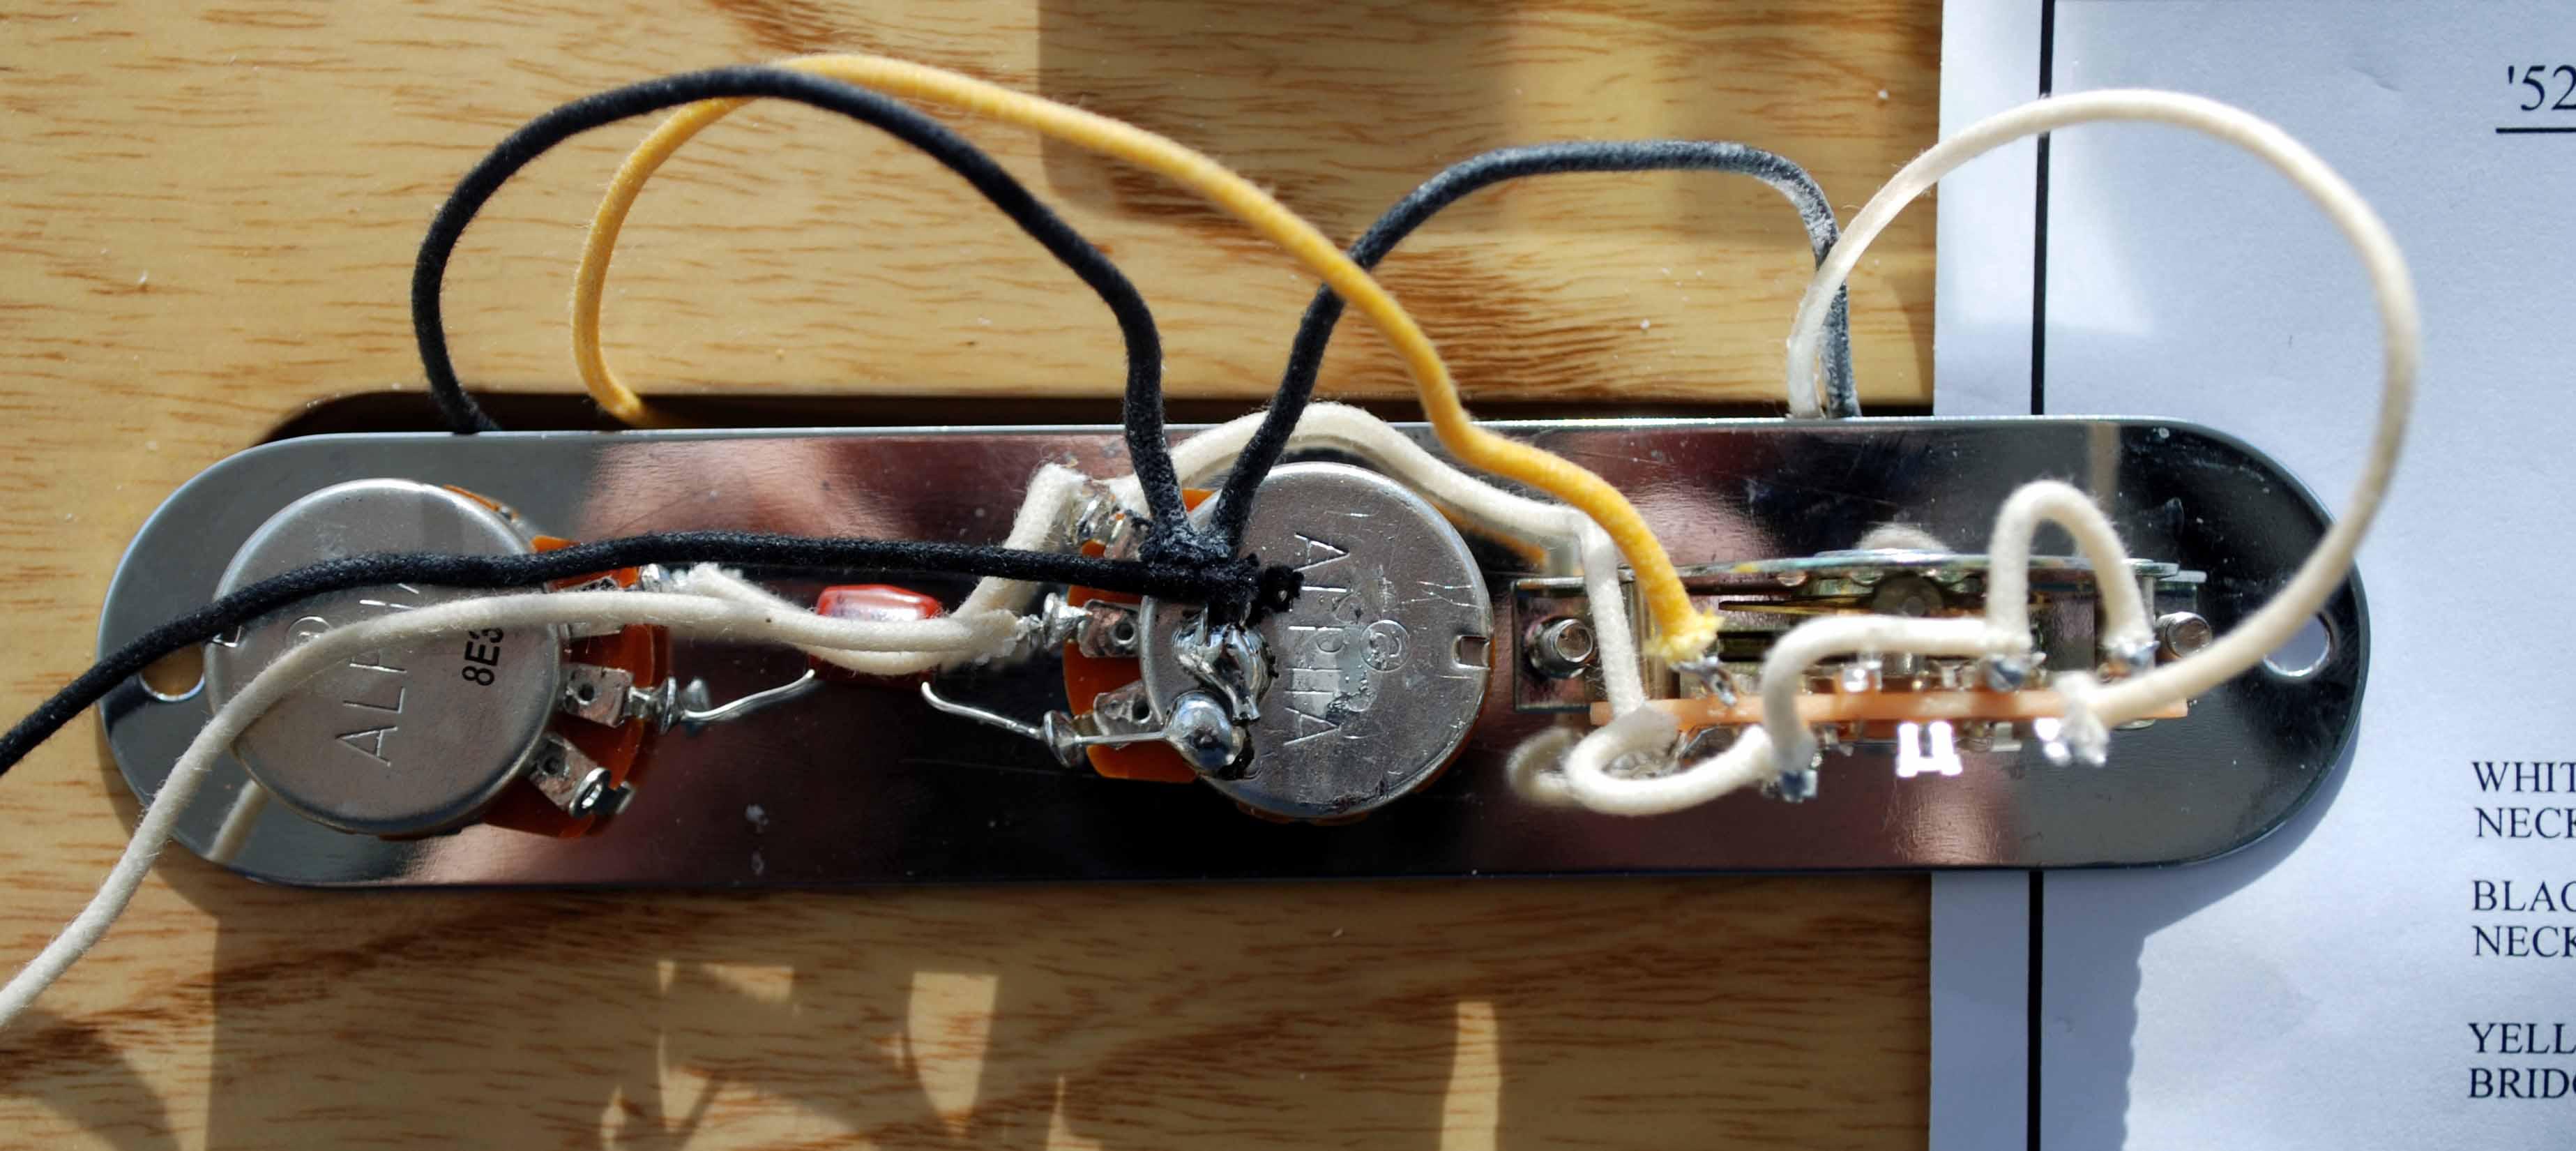 [EQHS_1162]  FF_5942] Telecaster Wiring Diagram On Fender Usa Standard Telecaster Wiring  Free Diagram   Fender 52 Tele Wiring Diagrams      Jidig Boapu Mohammedshrine Librar Wiring 101